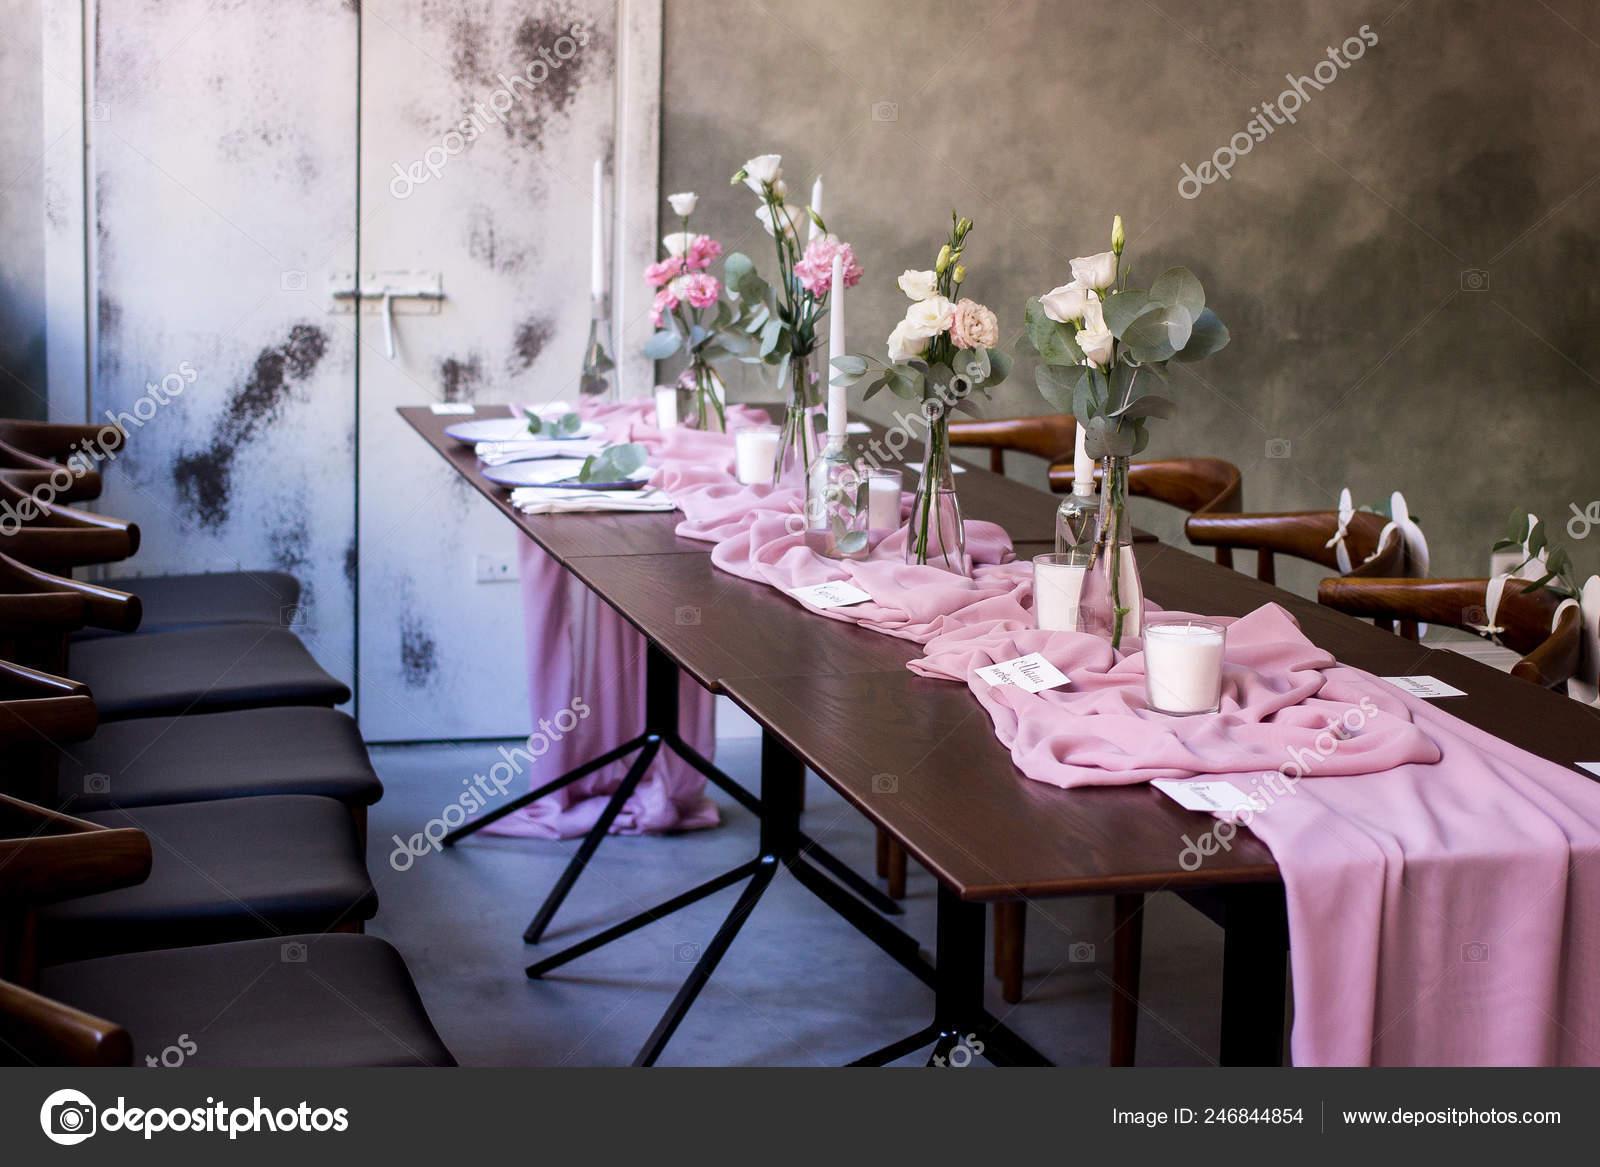 Elegant Dark Pink Wedding Banquet Table Glasses Dishes Flowers Decoration Stock Photo C Anyatachka95 Mail Ru 246844854